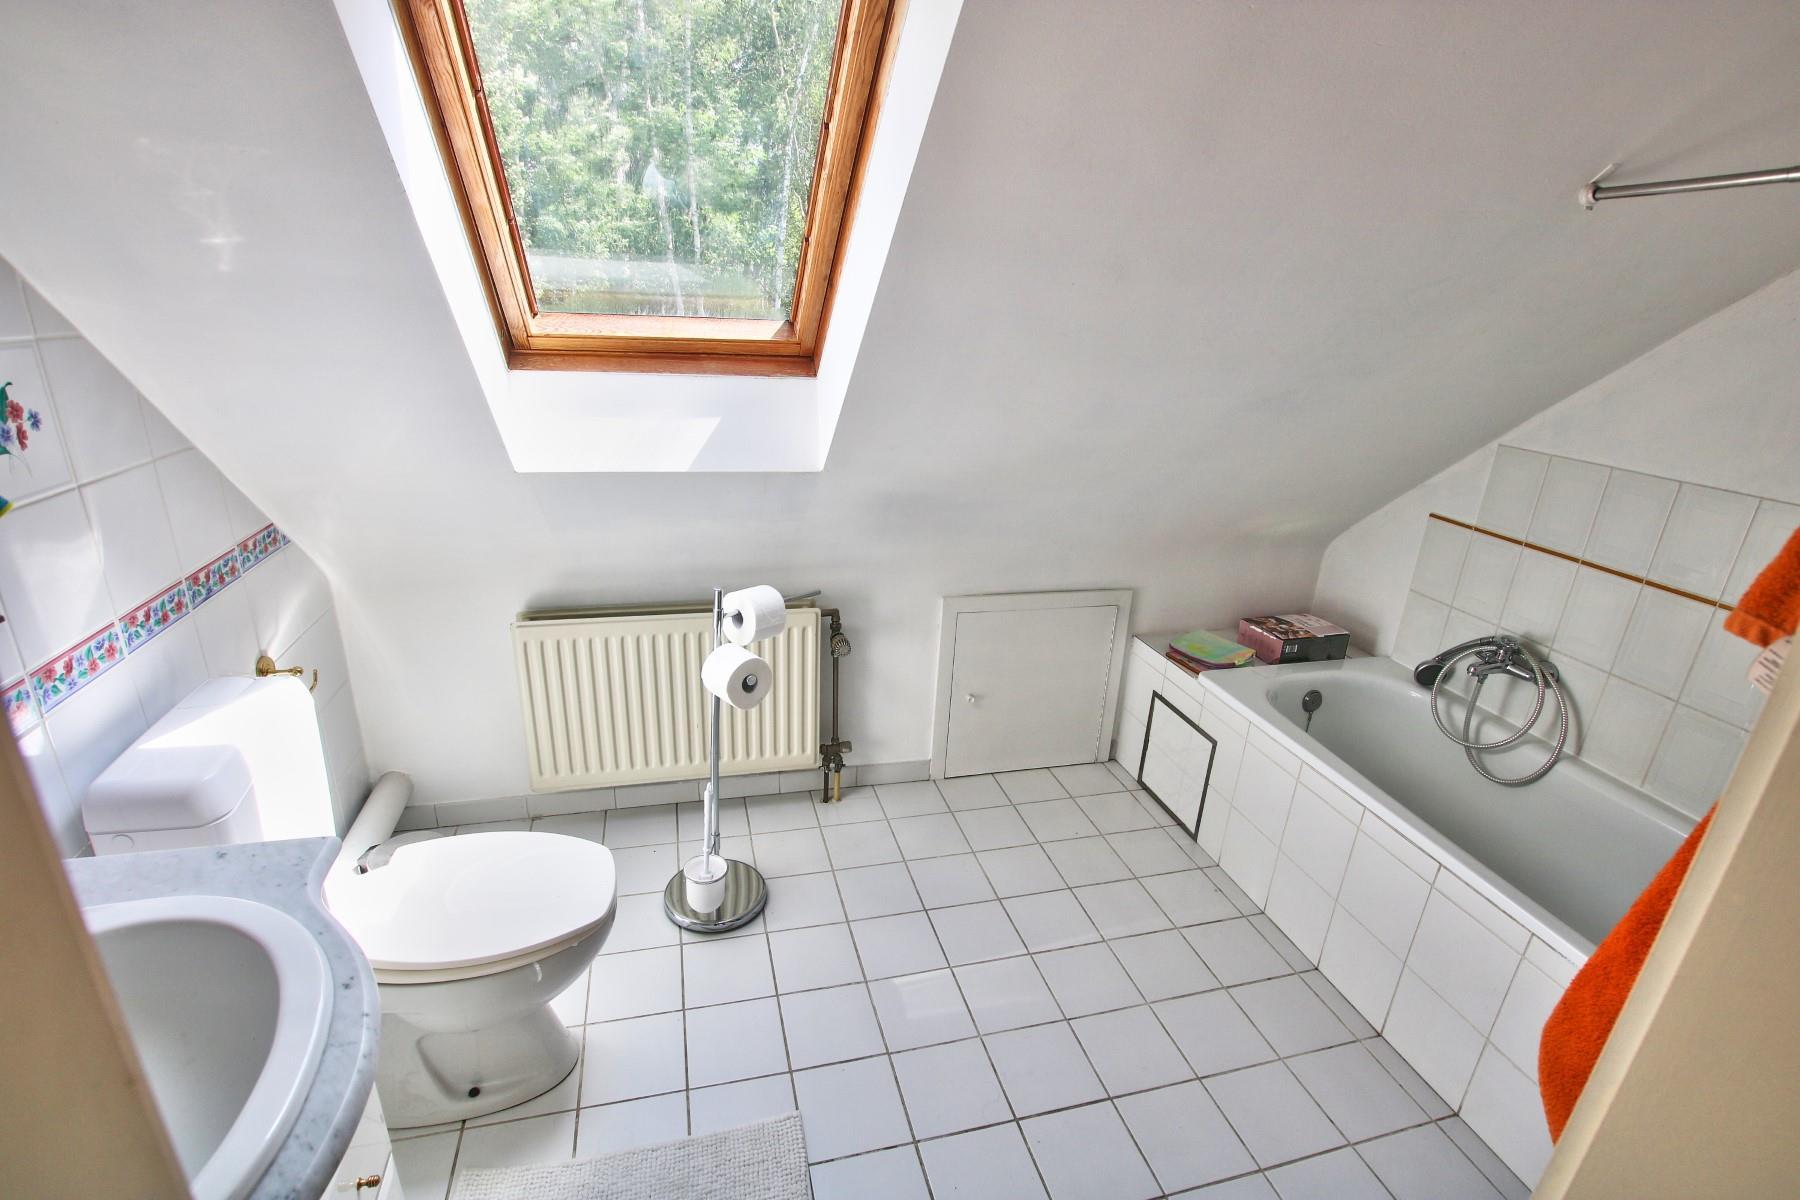 Huis - Woluwe-Saint-Lambert - #4103954-11